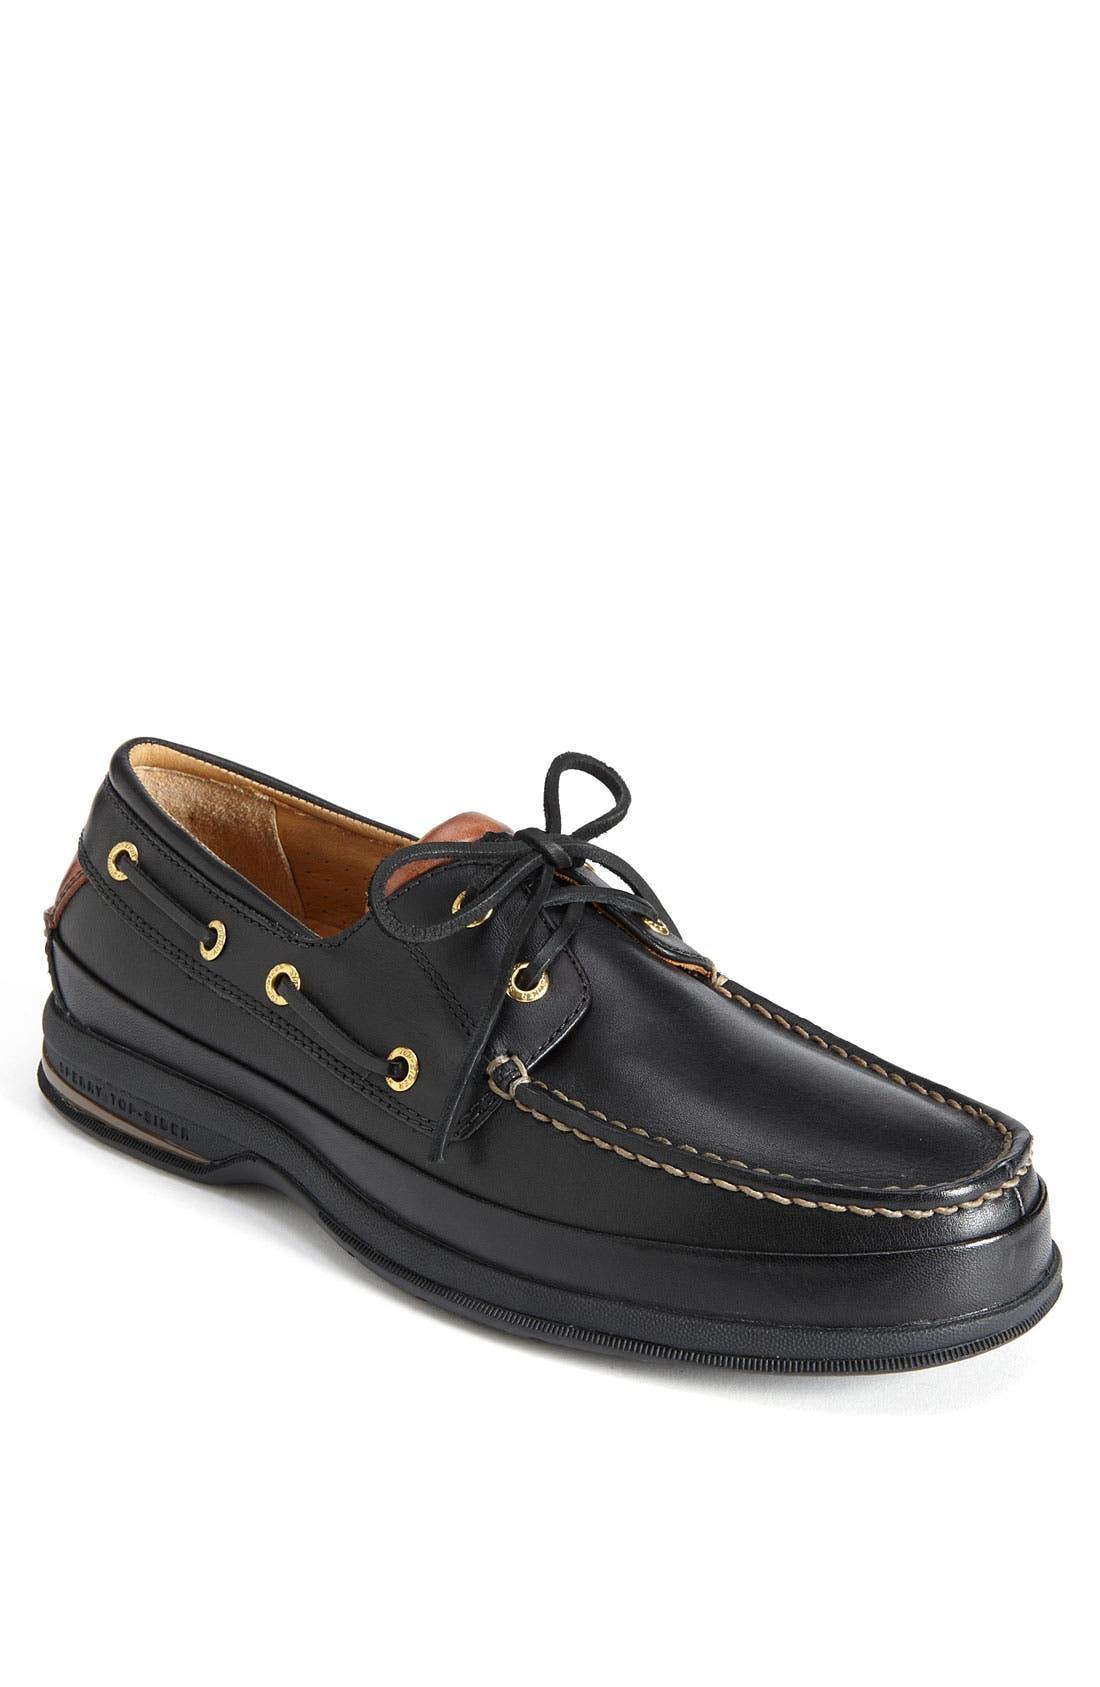 Alternate Image 1 Selected - Sperry 'Gold Cup 2-Eye ASV' Boat Shoe (Men)